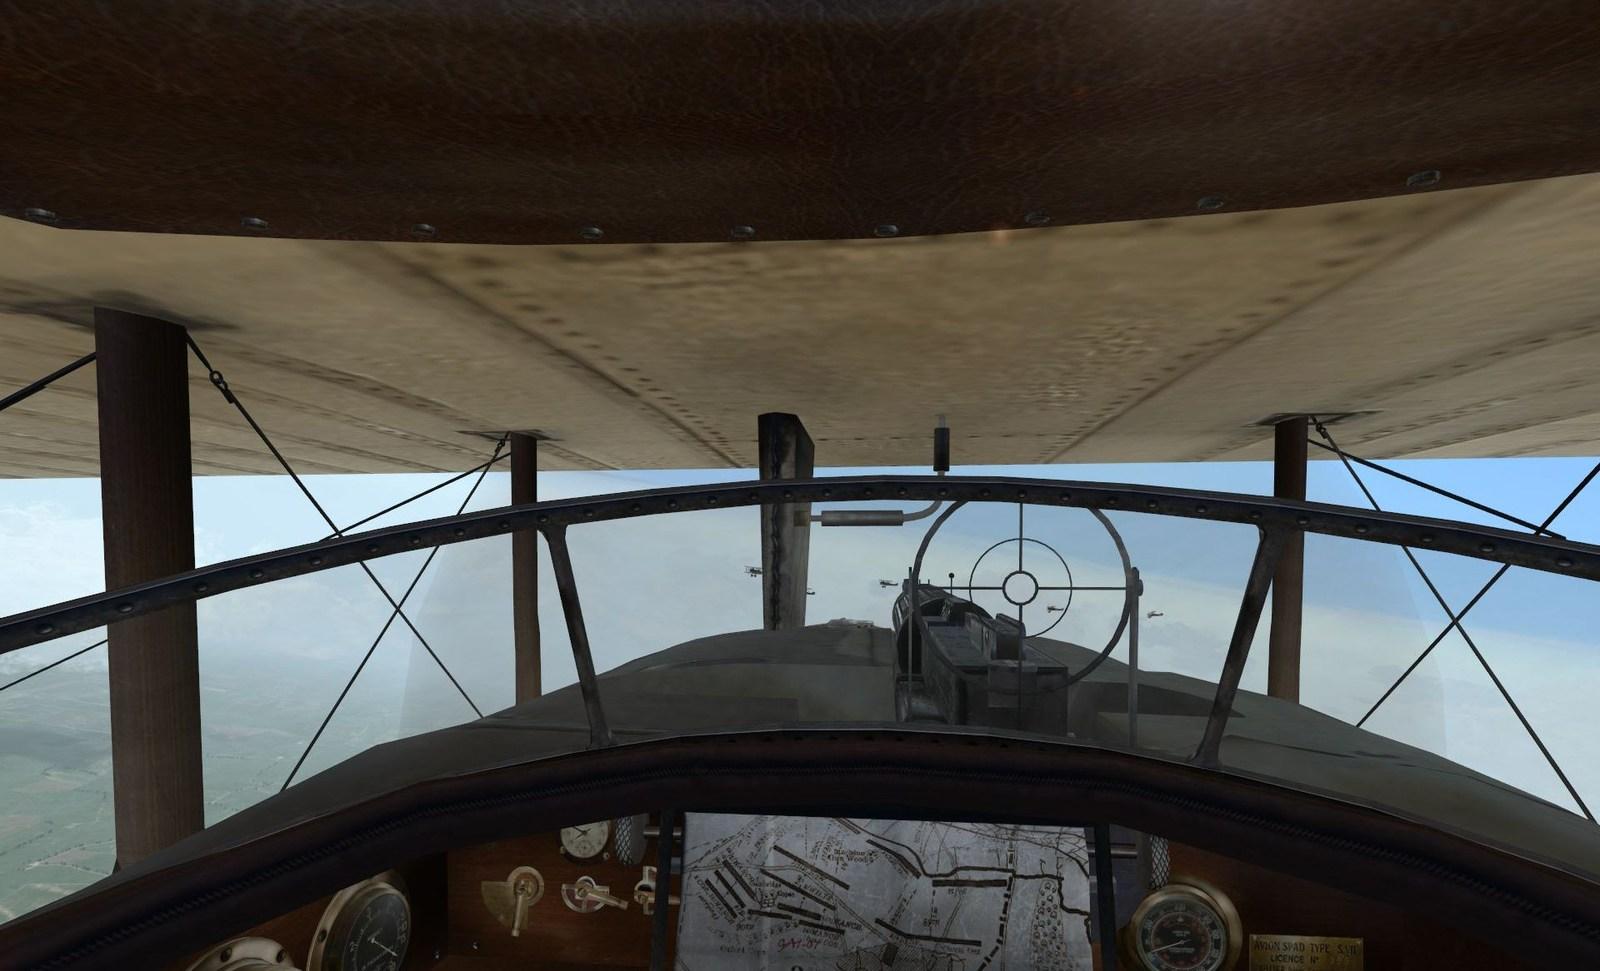 1sr May 1918, Spa 77 patrol mission